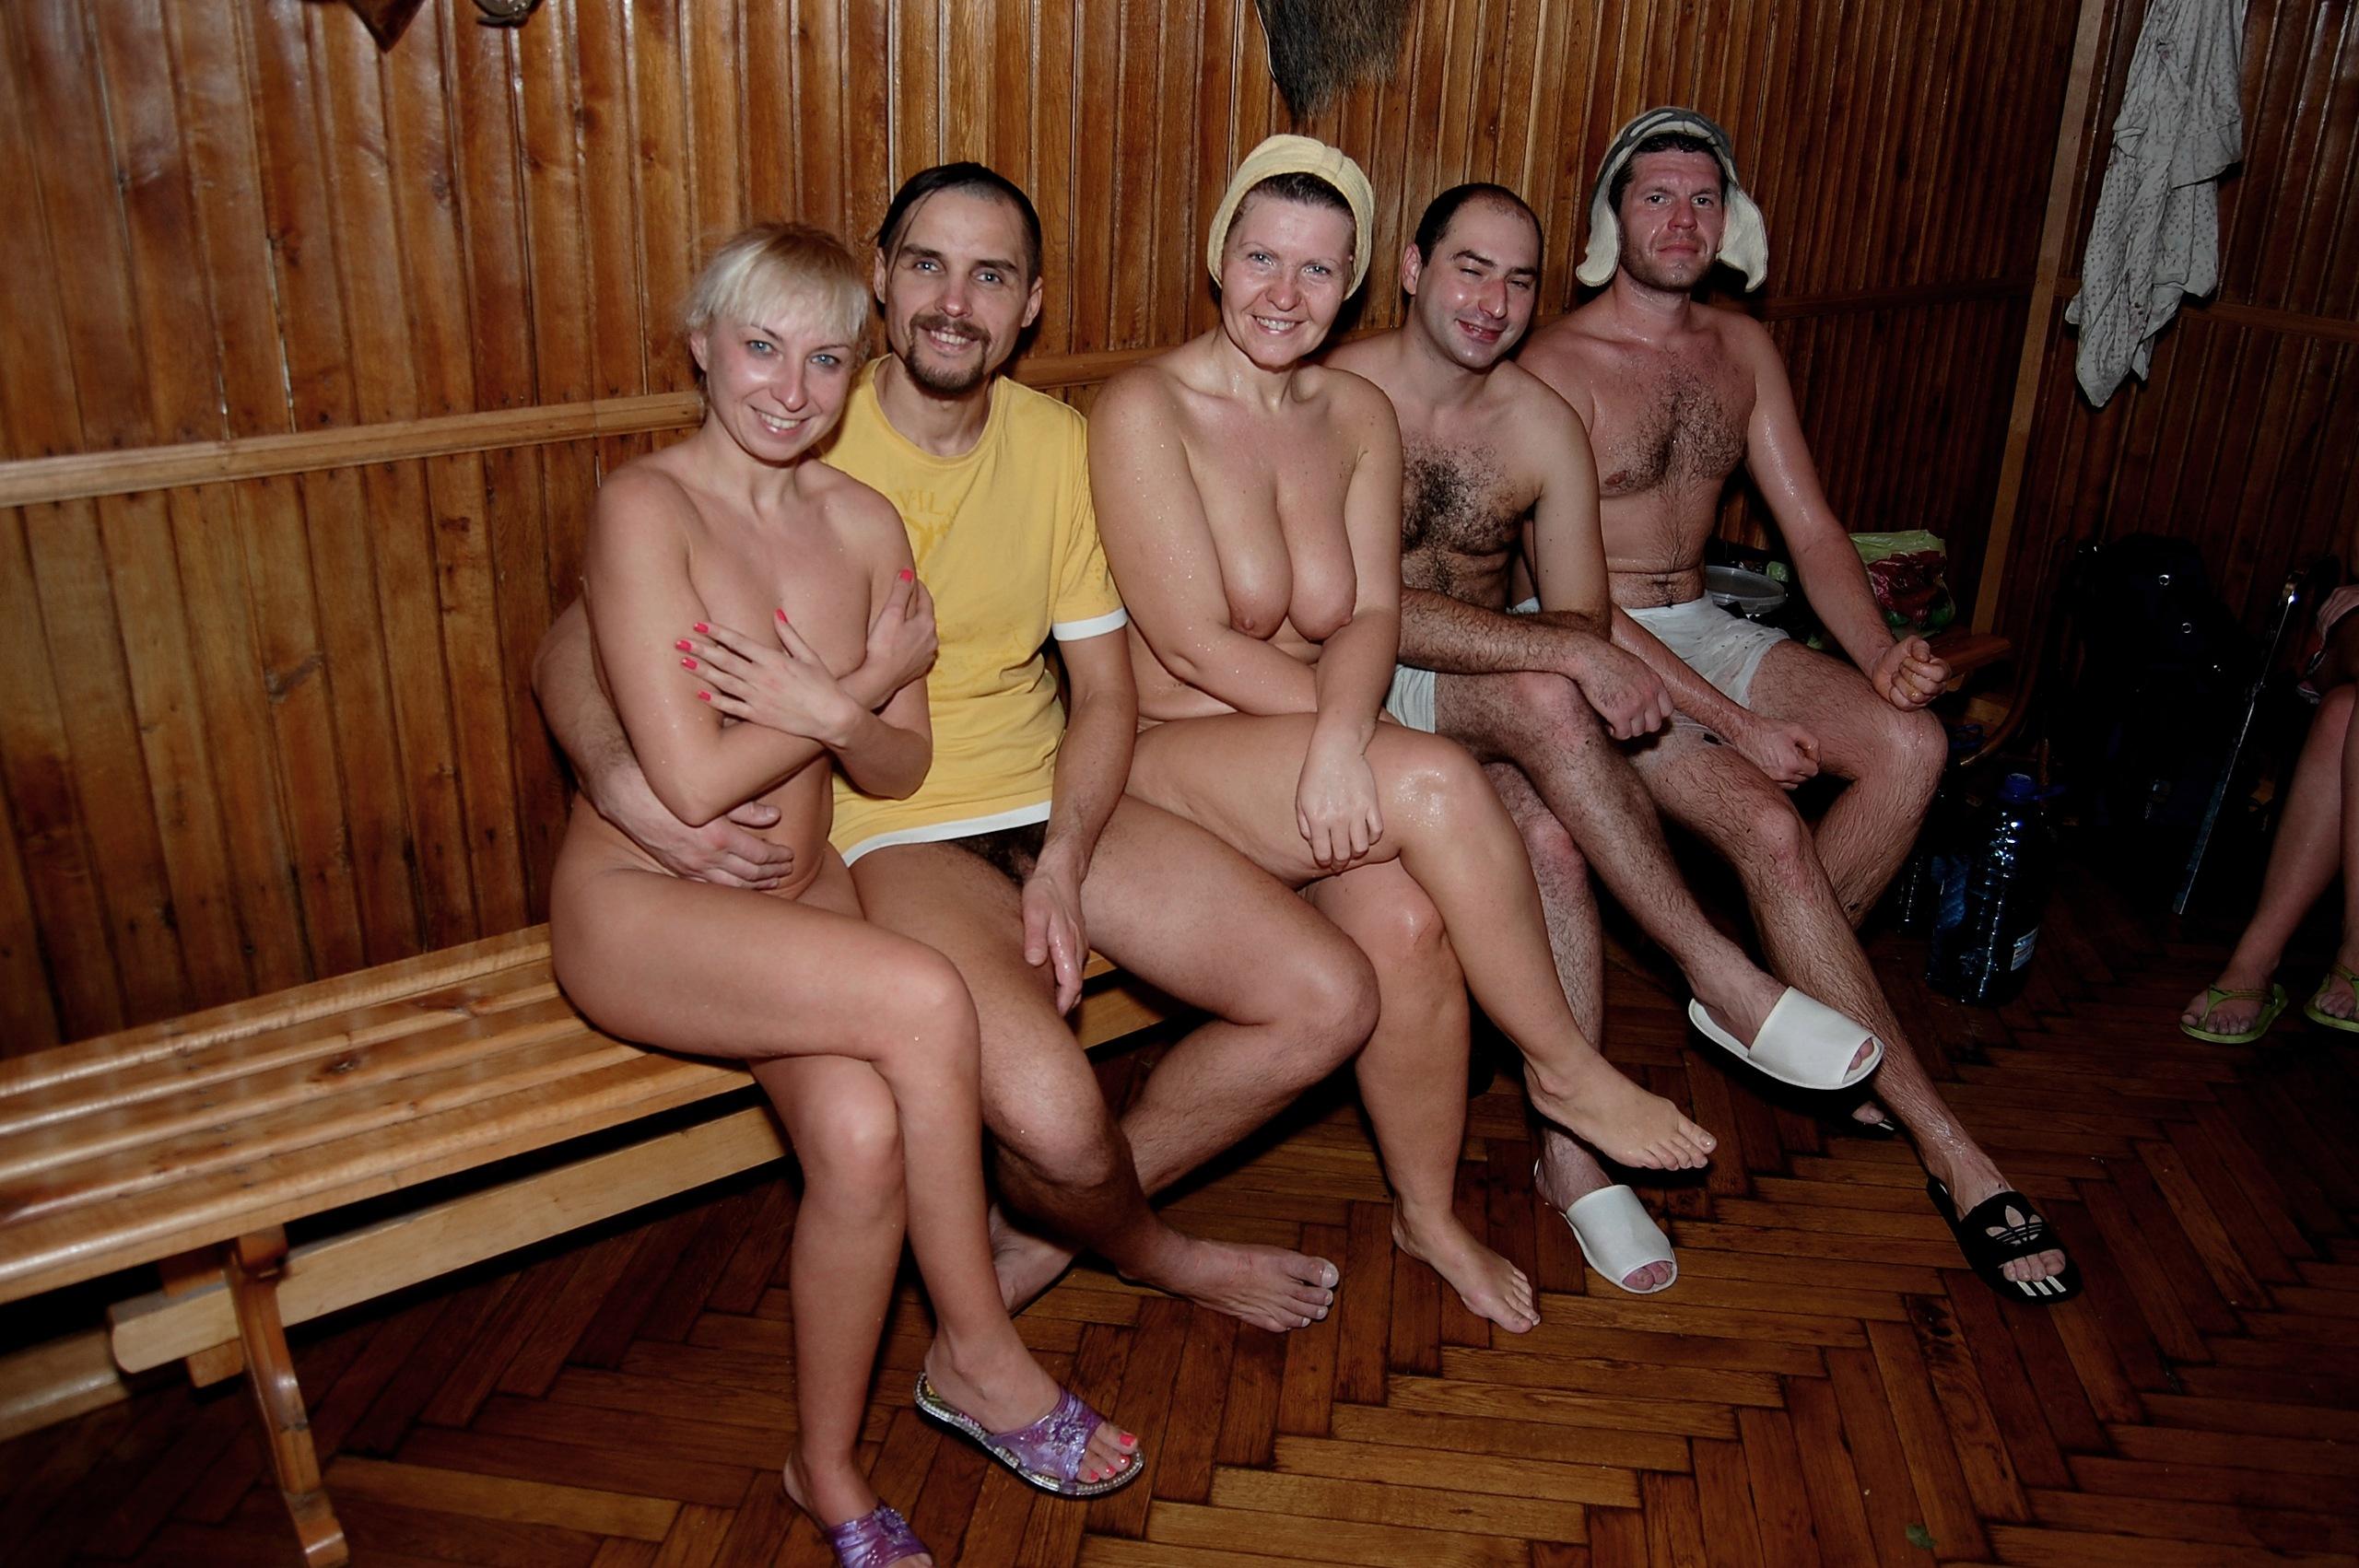 Group naked sauna, free krissy lynn lesbian porn